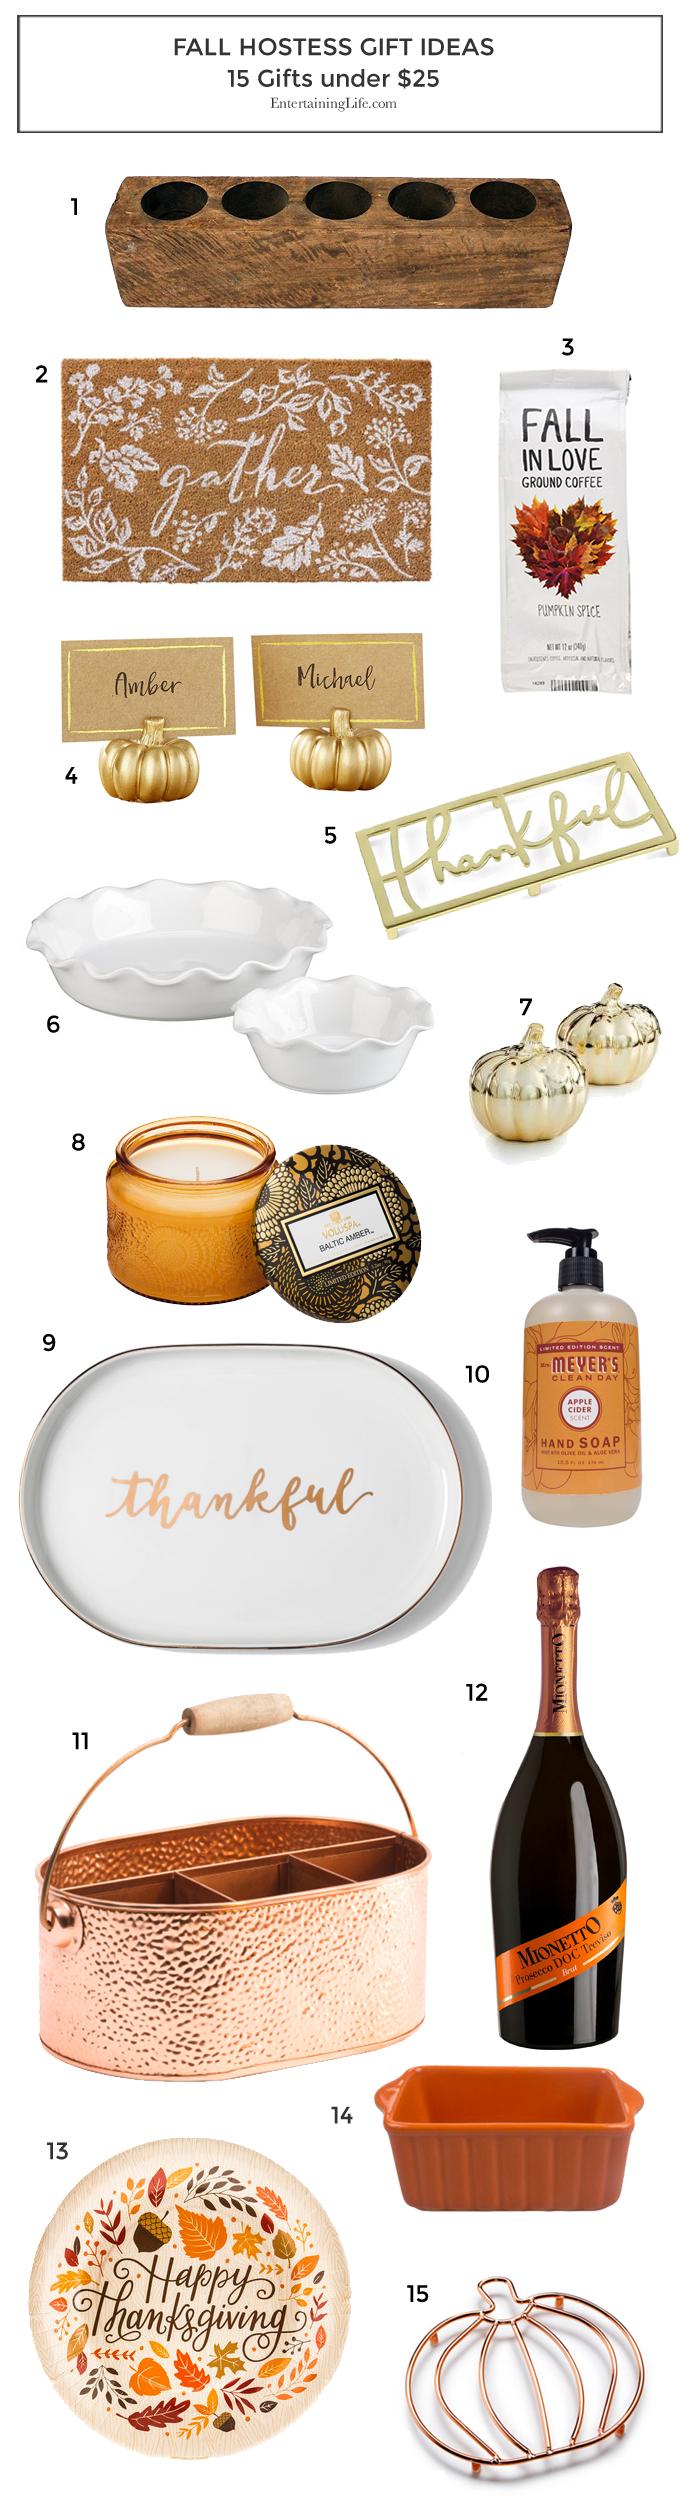 Inexpensive Fall Hostess Gift Ideas Fall Hostess Gifts Hostess Gifts Inexpensive Hostess Gifts